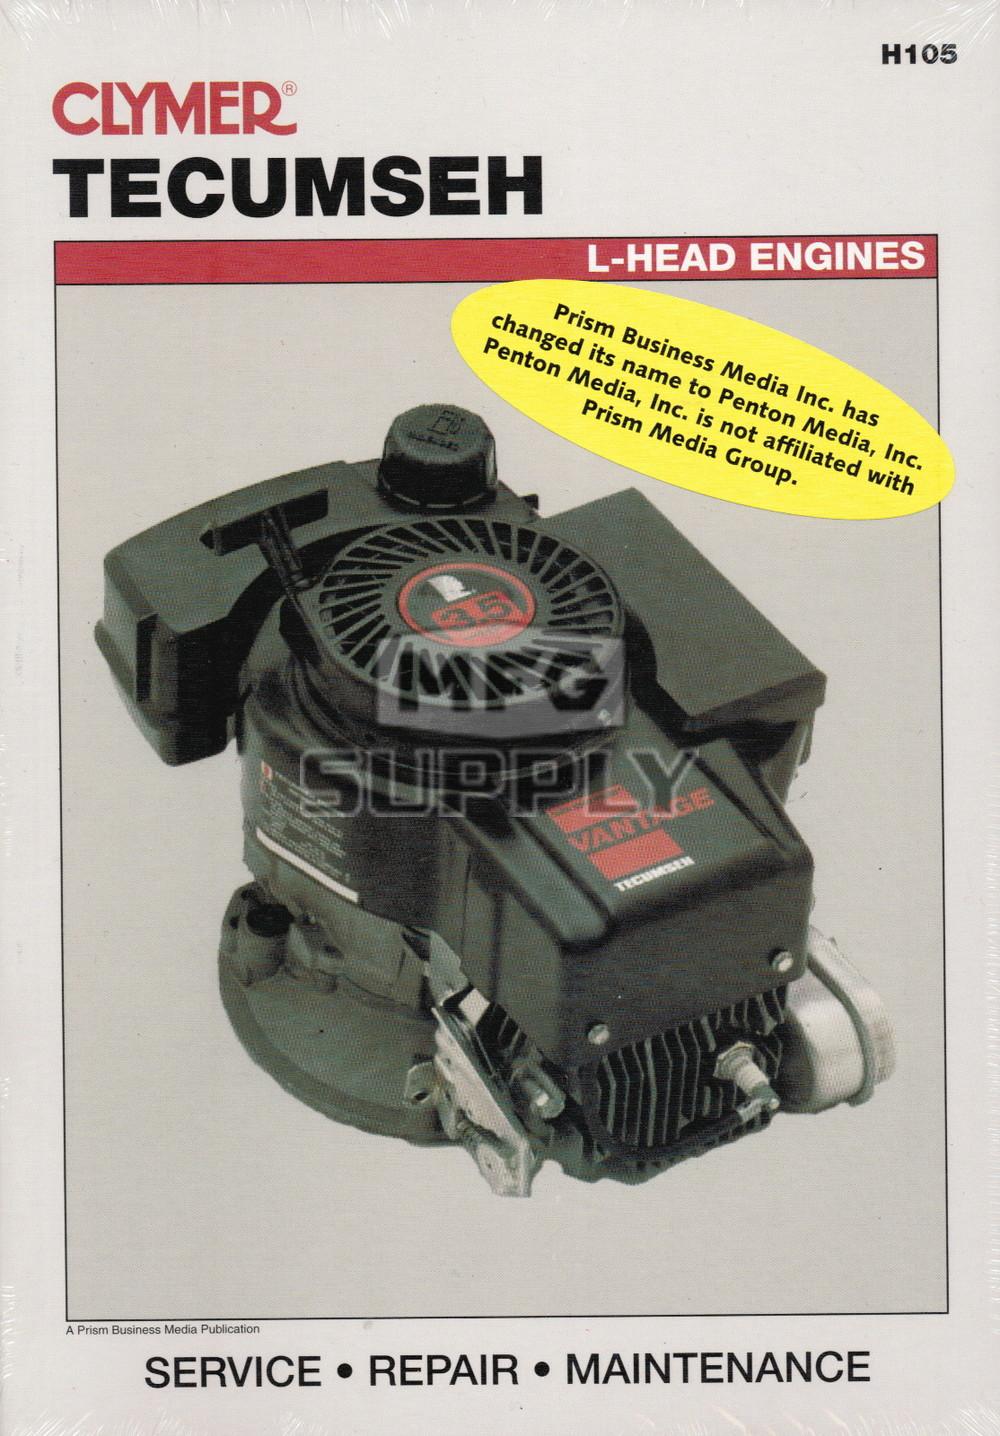 Tecumseh Small Engines Shop Manuals Wiring Diagram Master Blogs Pin 35 Hp Carburetor User Guide On Pinterest L Head Repair Manual Engine Parts Mfg Supply Rh Mfgsupply Com Service 5